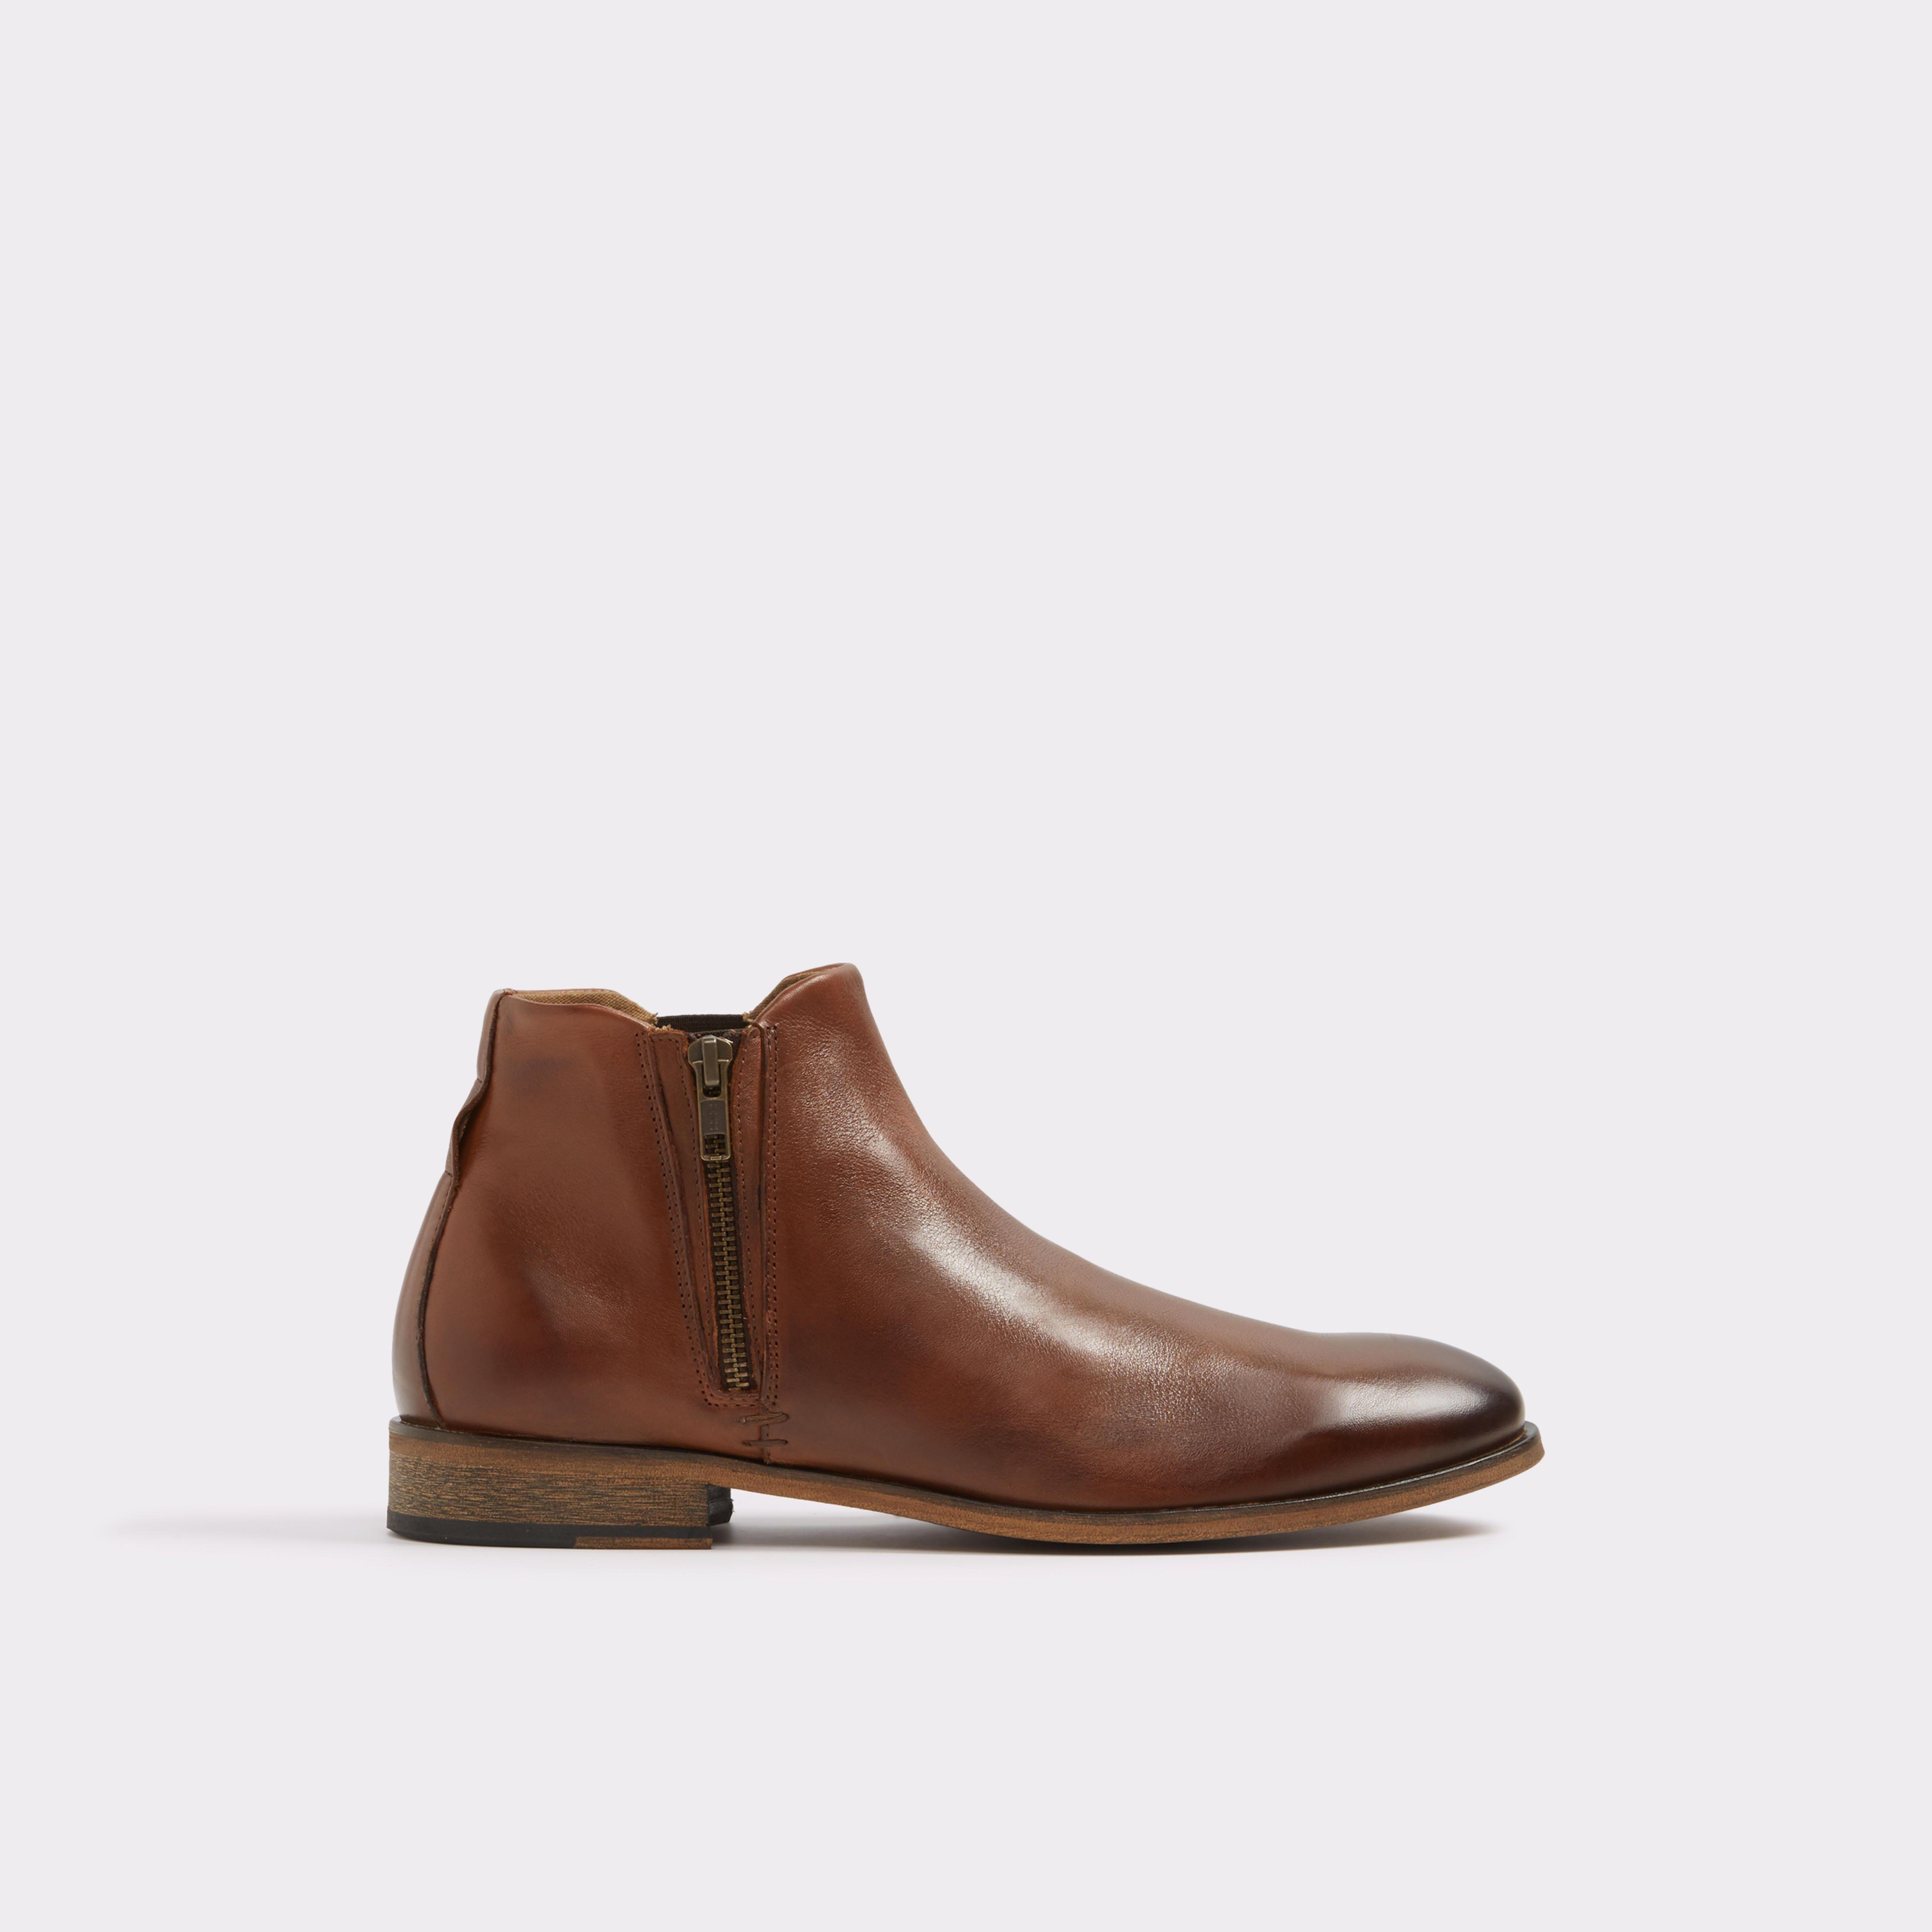 Frake Cognac Men's Dress boots | ALDO